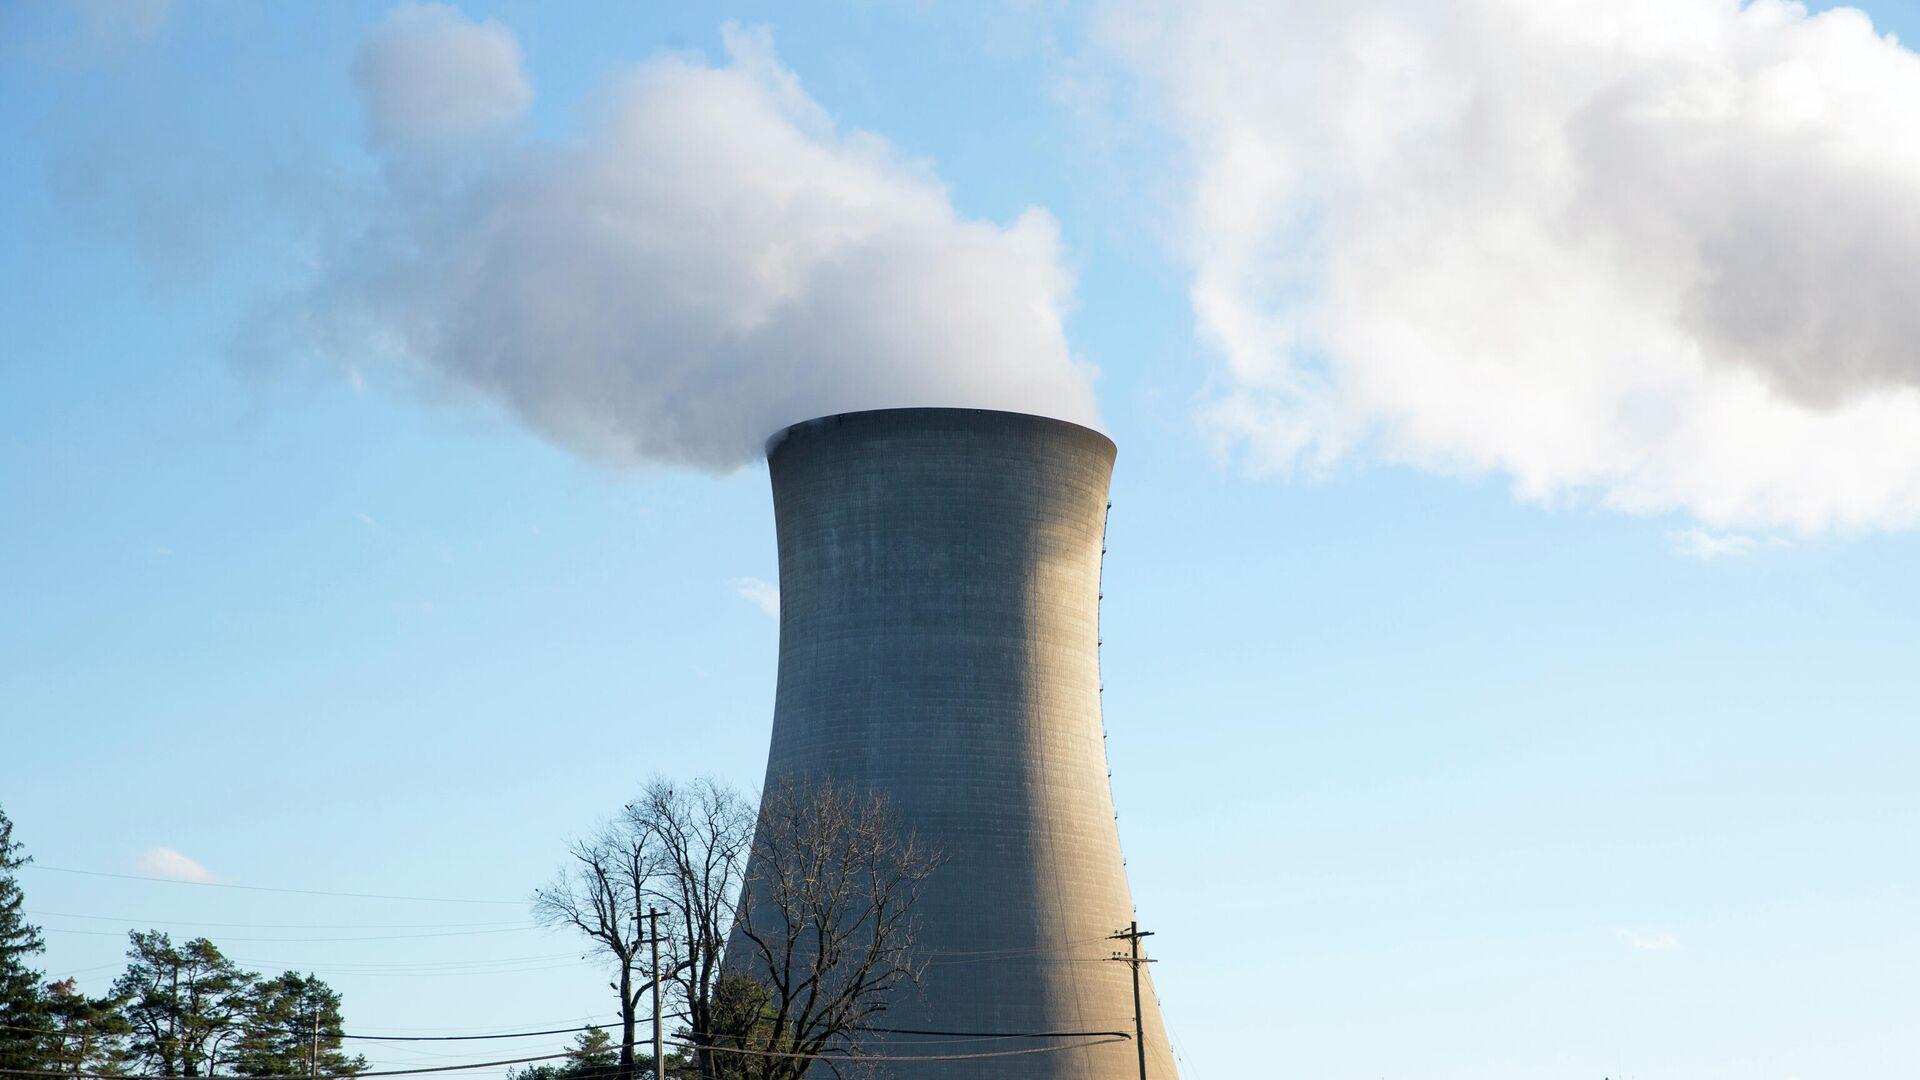 Una planta nuclear en EEUU - Sputnik Mundo, 1920, 25.09.2021